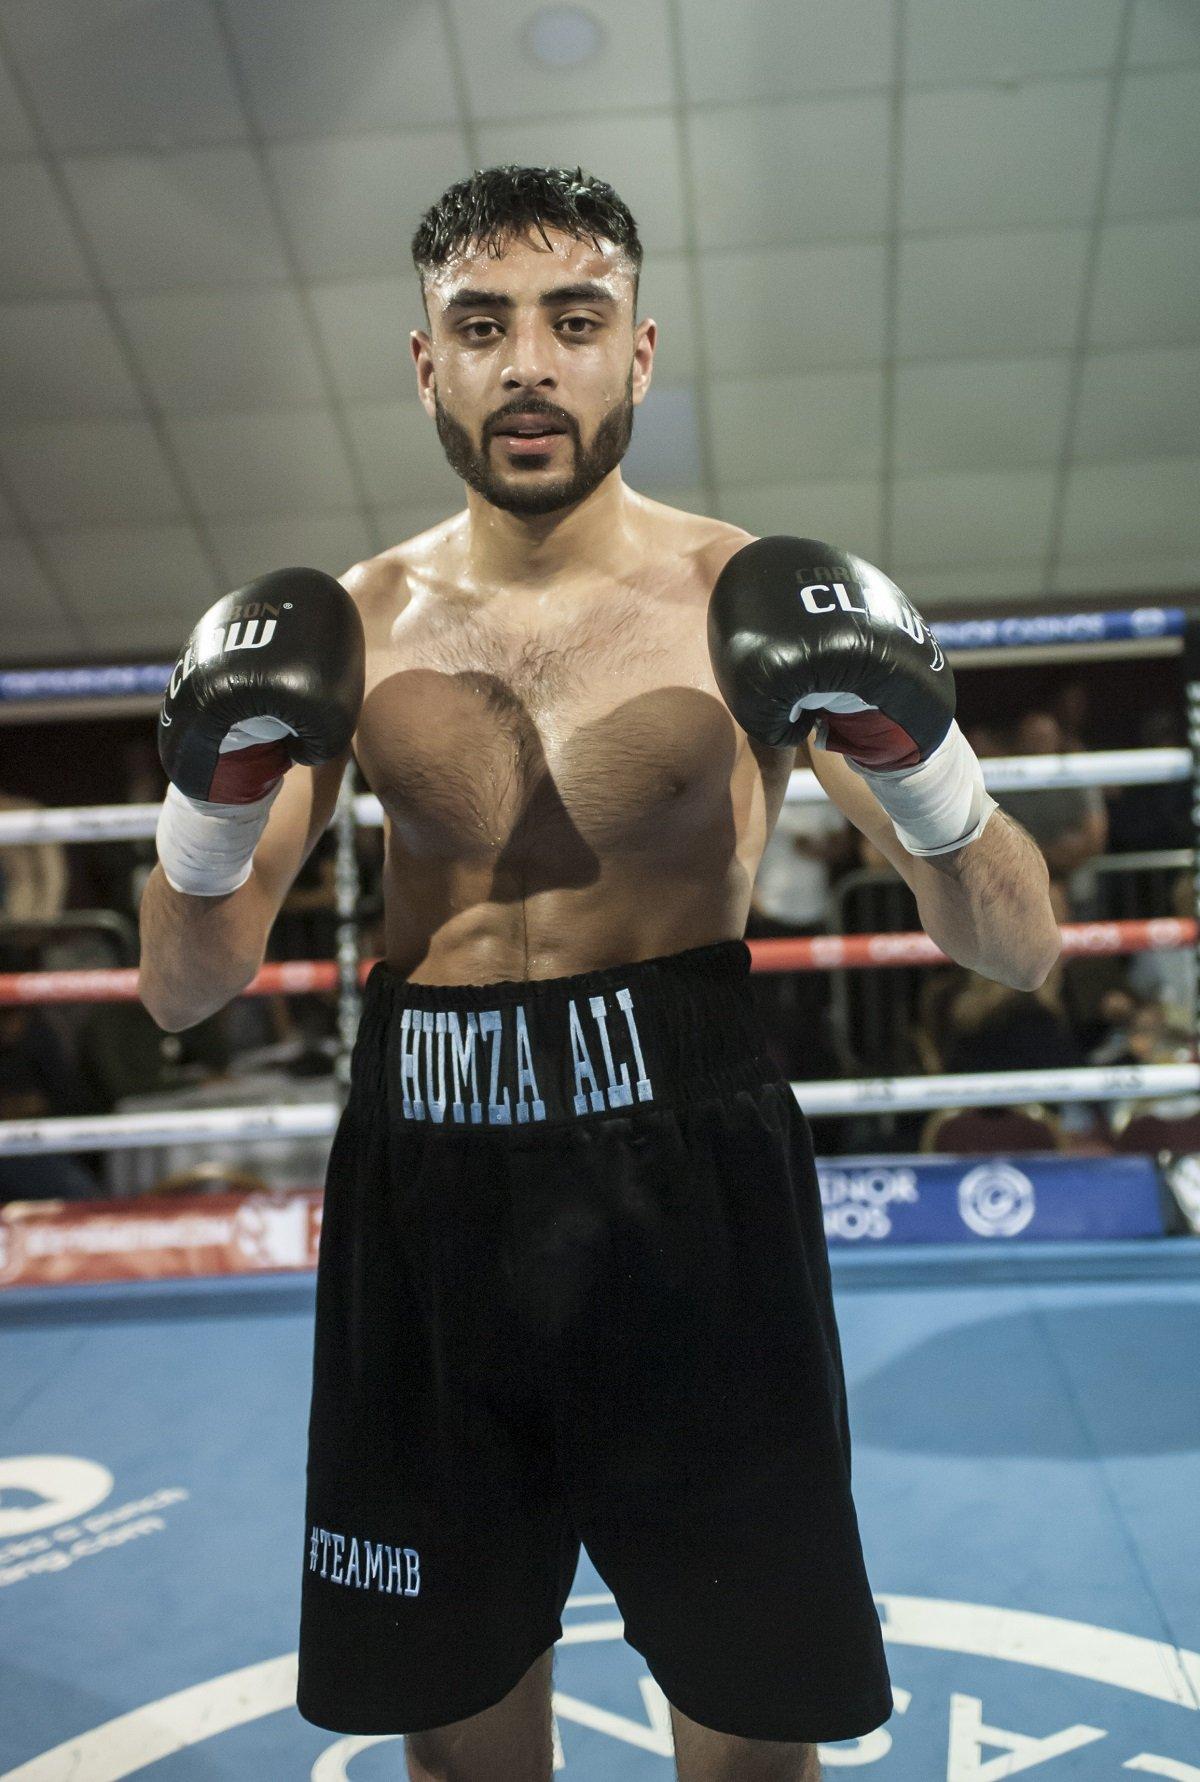 Humza Ali British Boxing Press Room